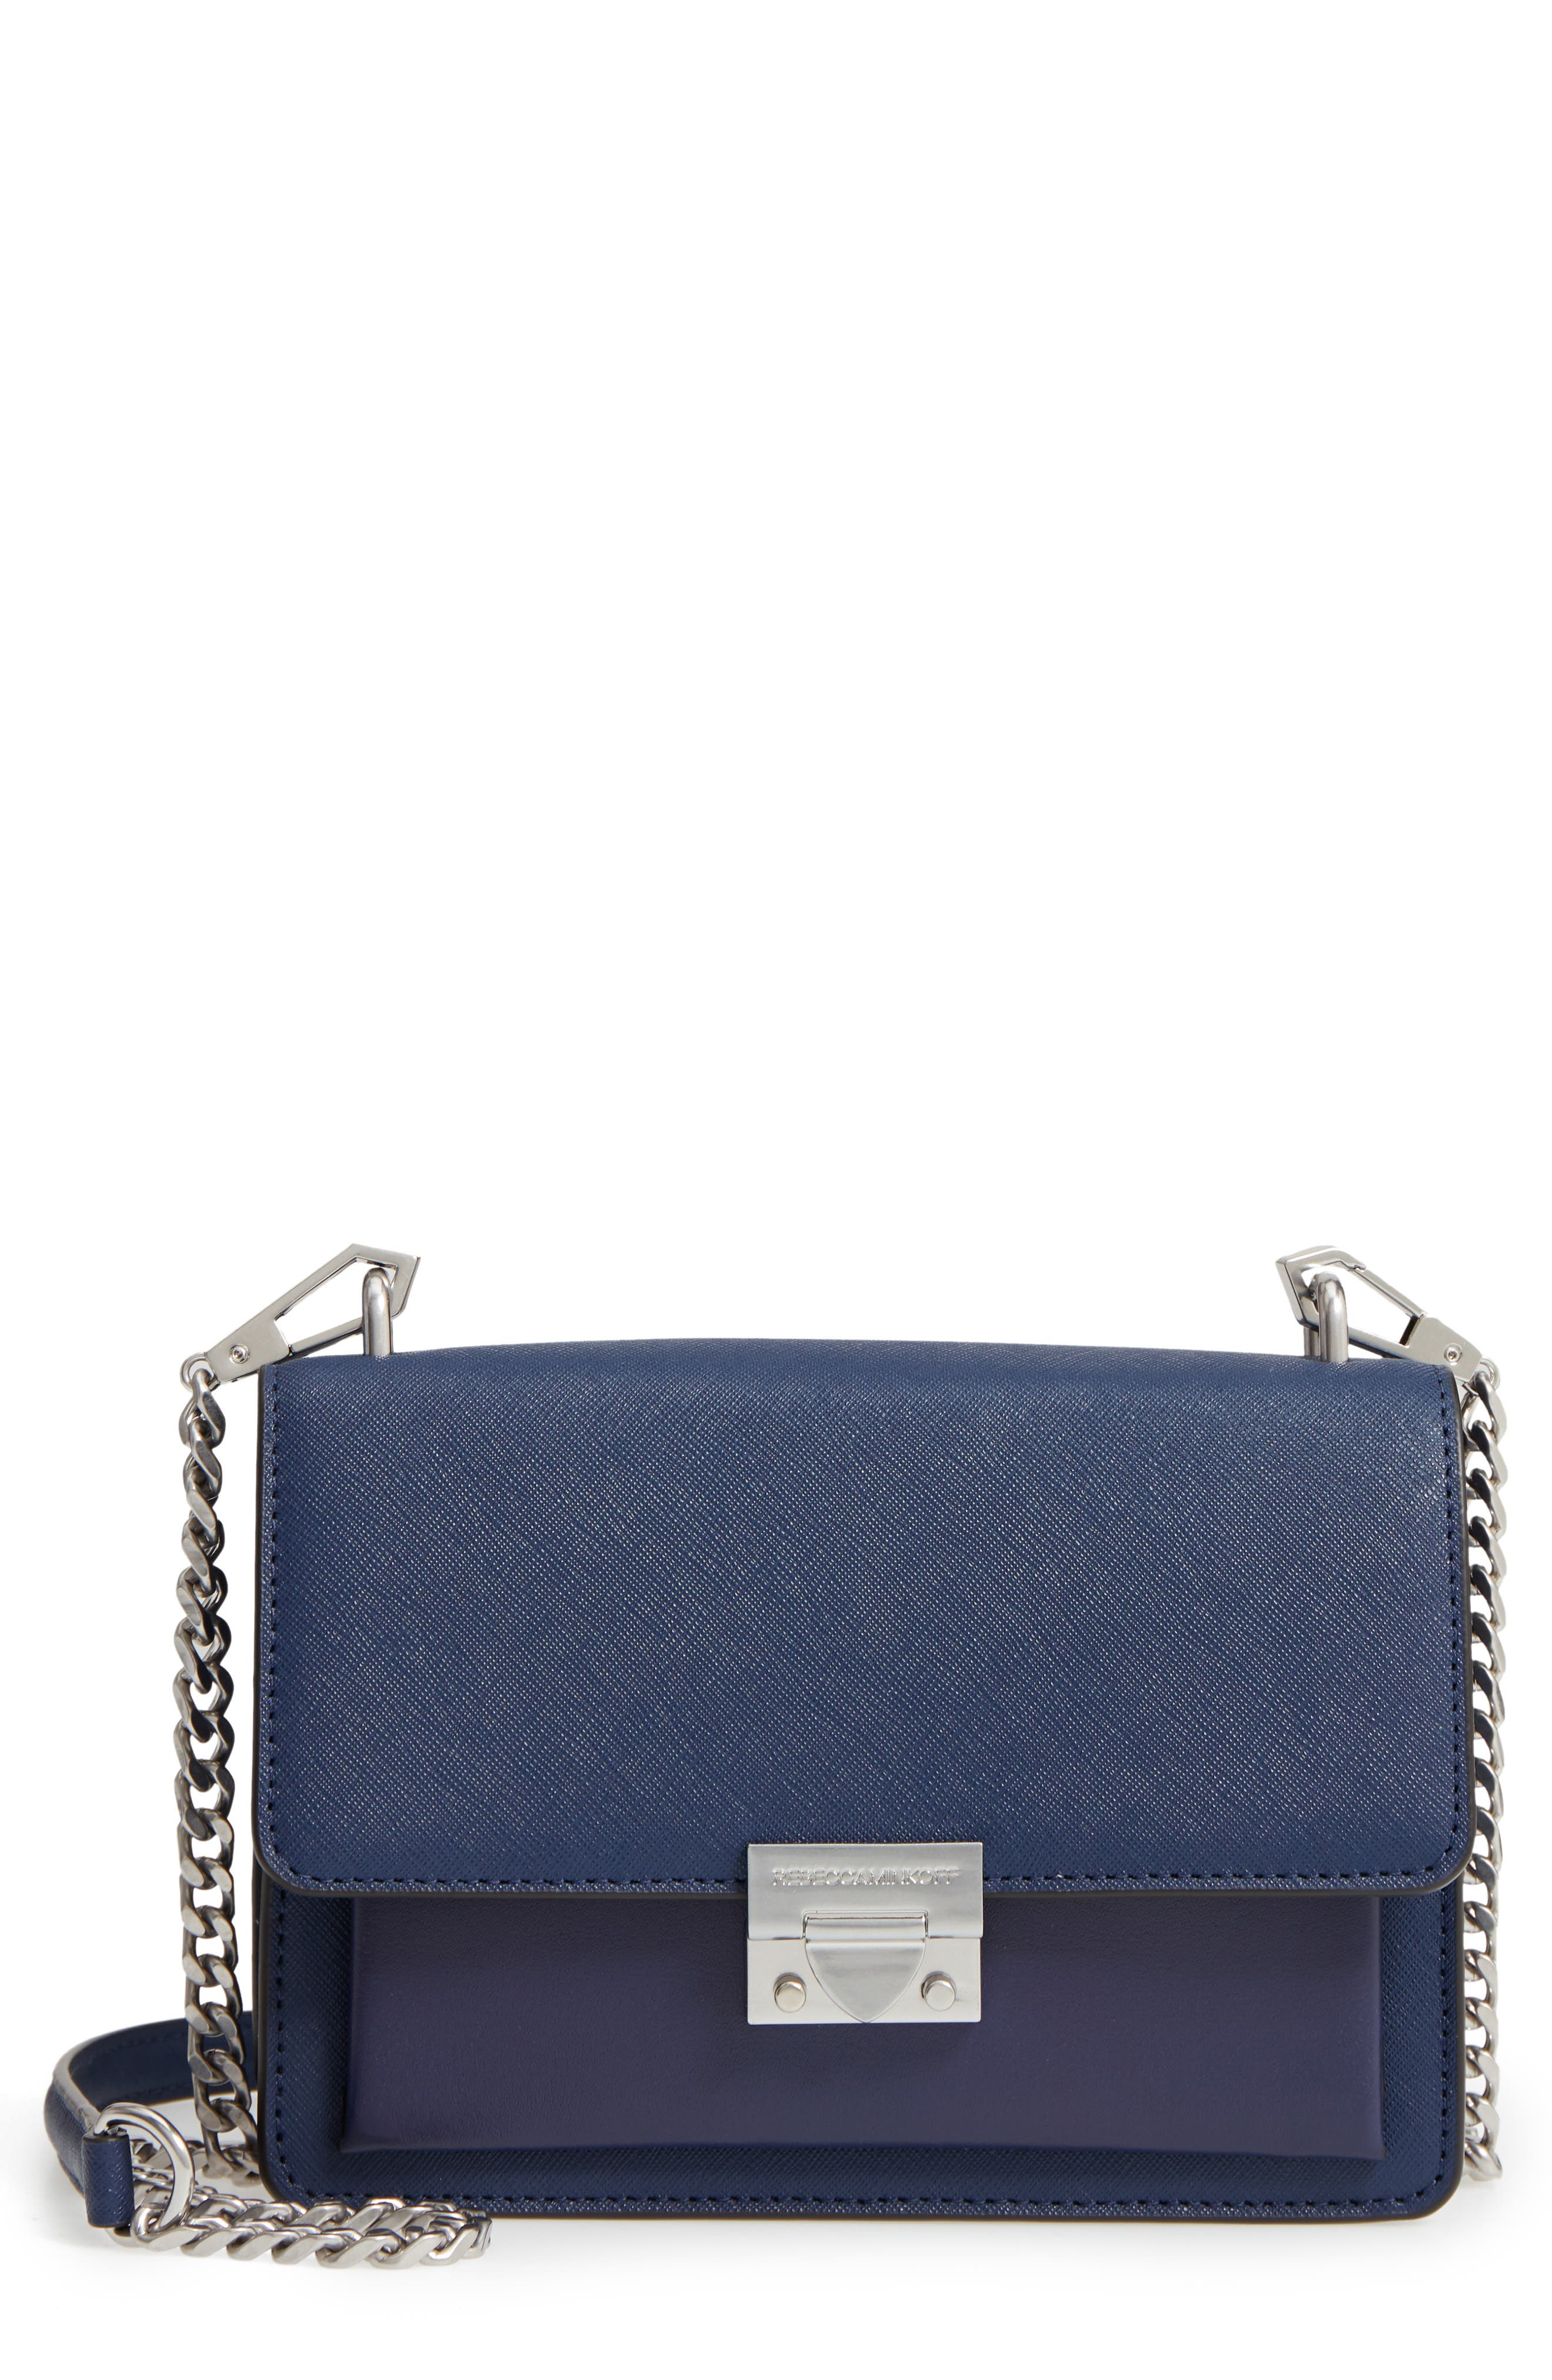 Medium Christy Leather Shoulder Bag,                             Main thumbnail 3, color,